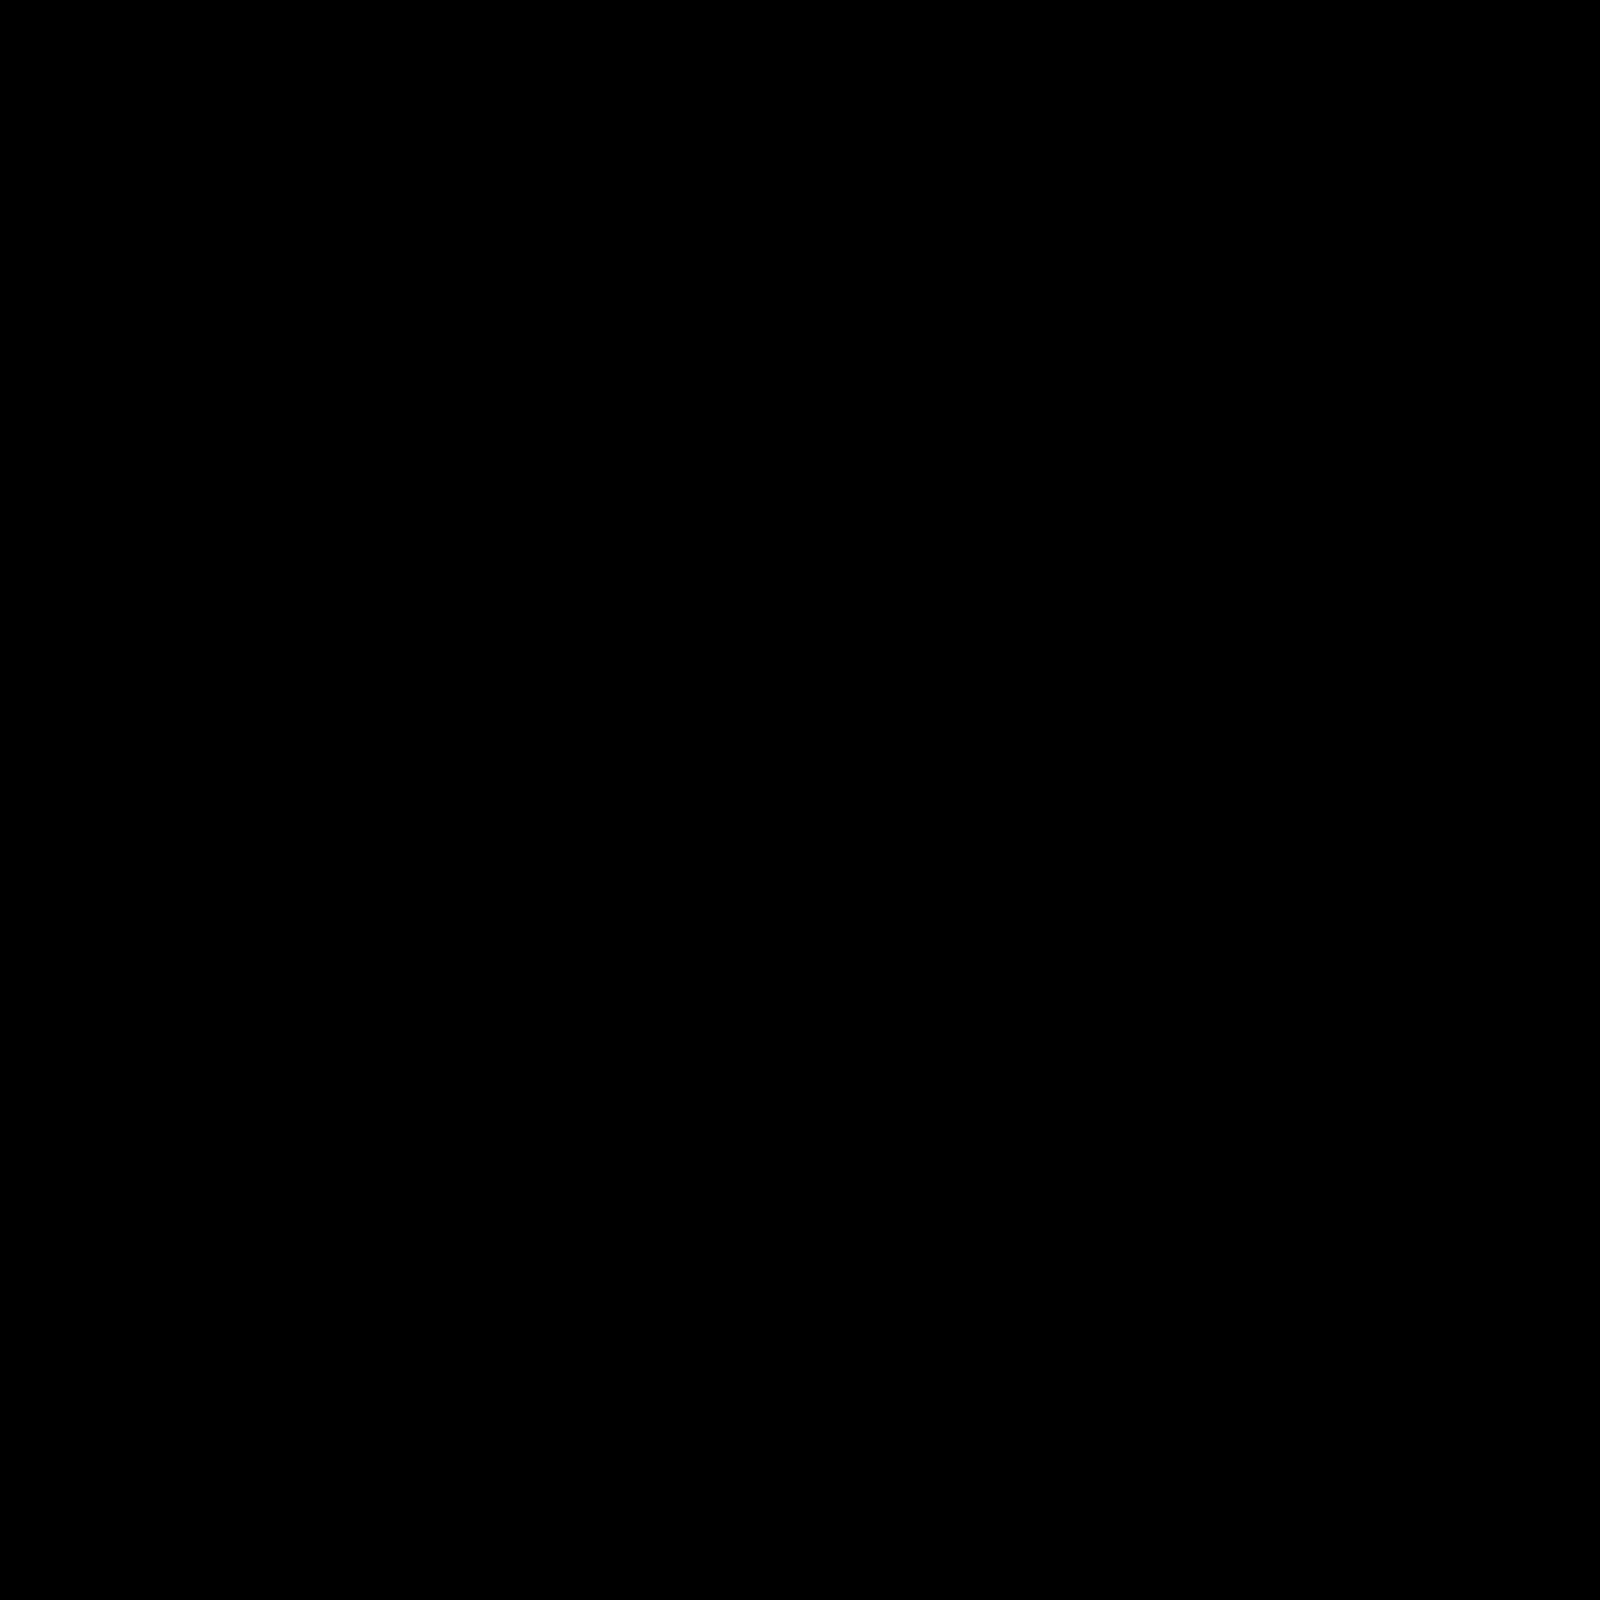 Leanpub icon